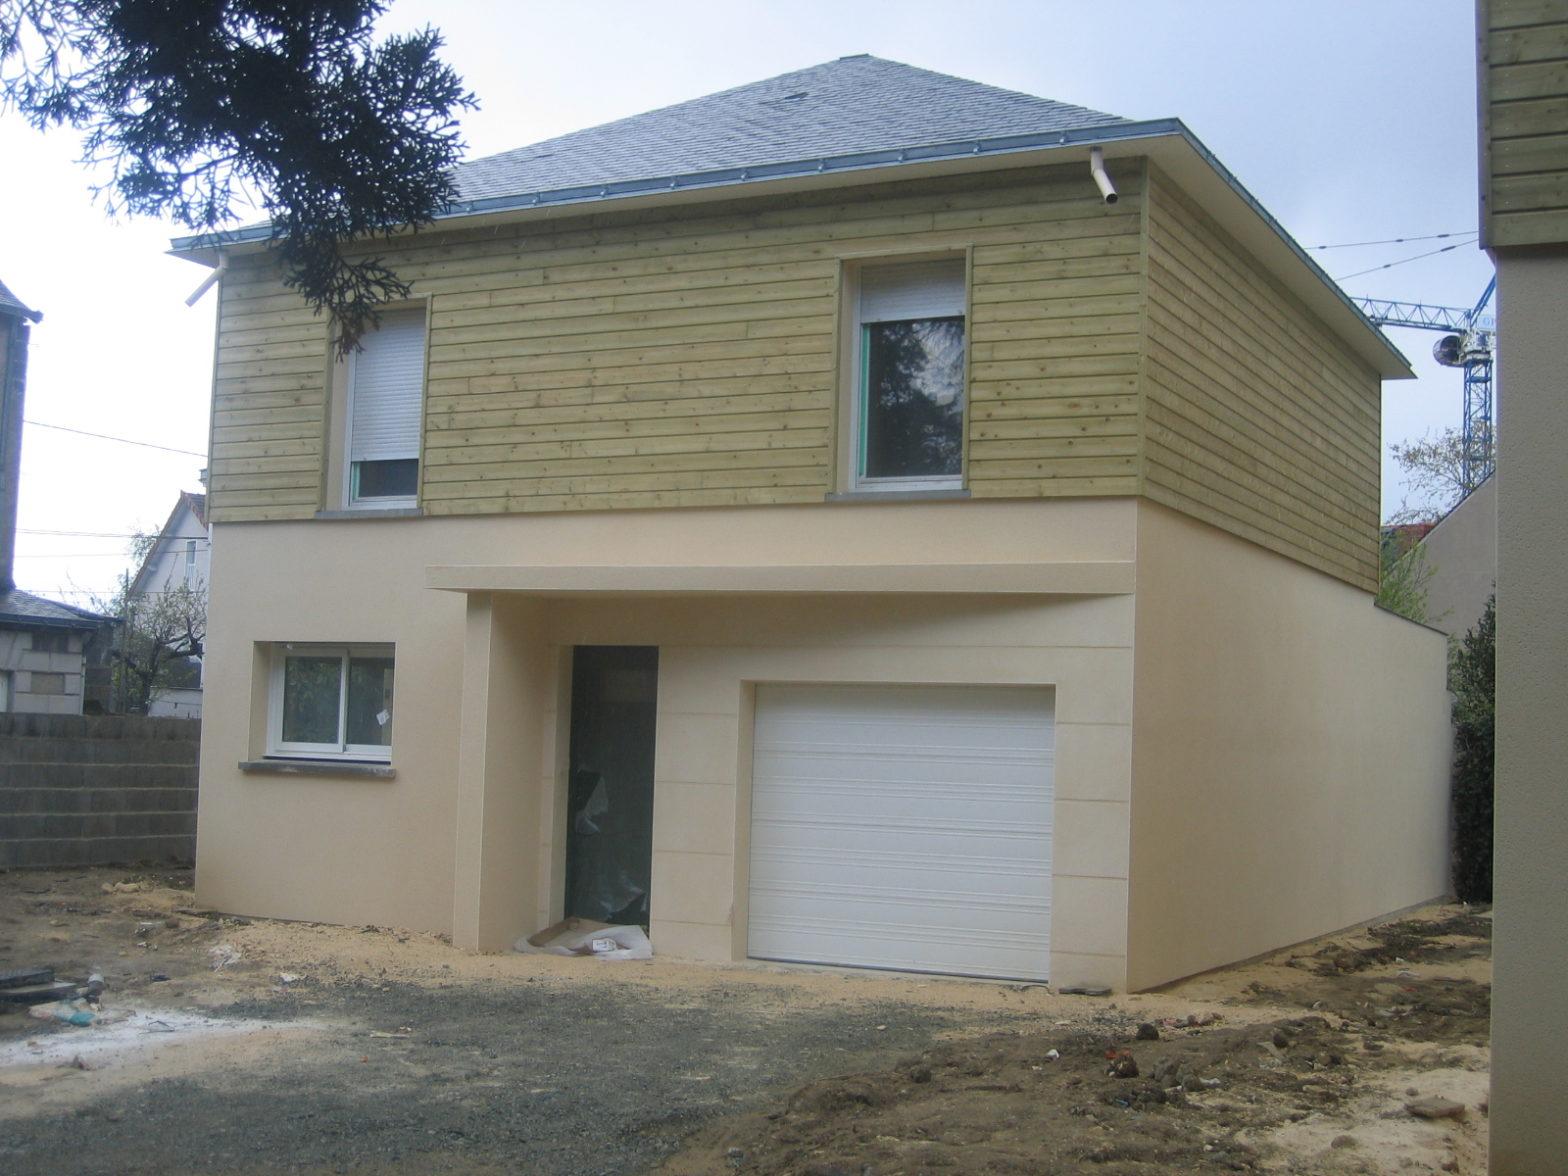 maison etage r+1 toit monopente angers 49